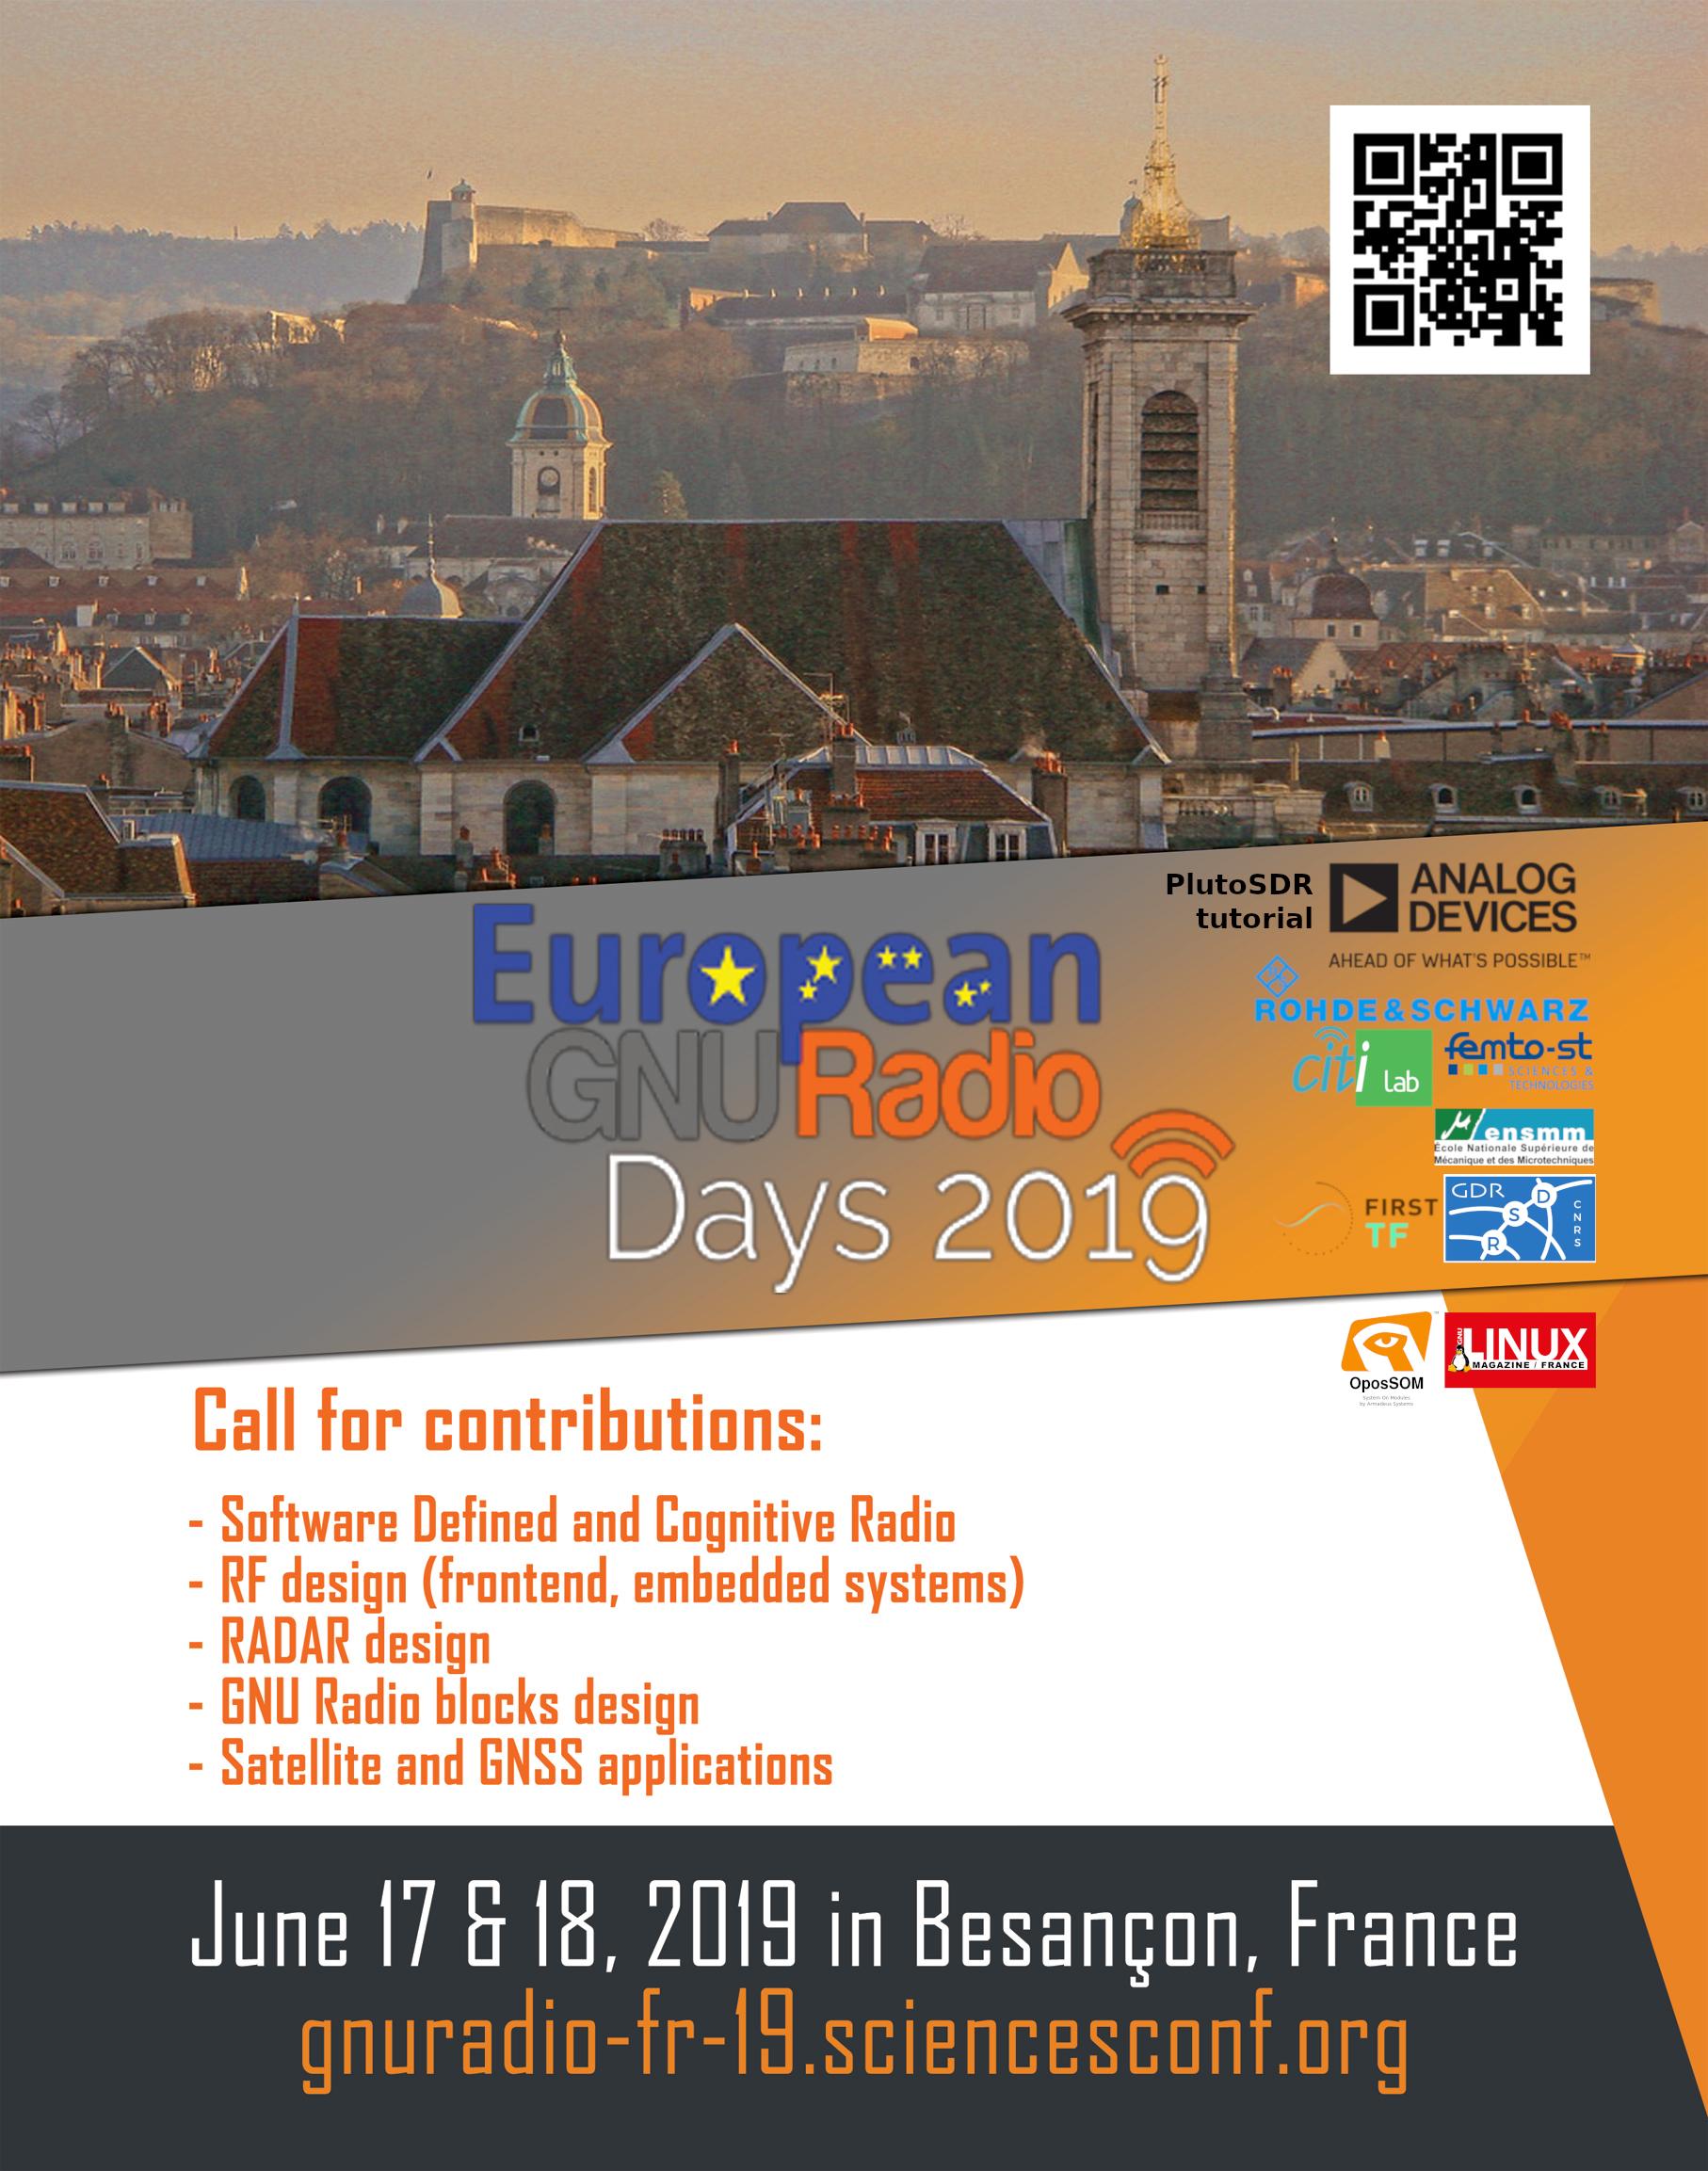 European GNU Radio Days 2019 - Sciencesconf org